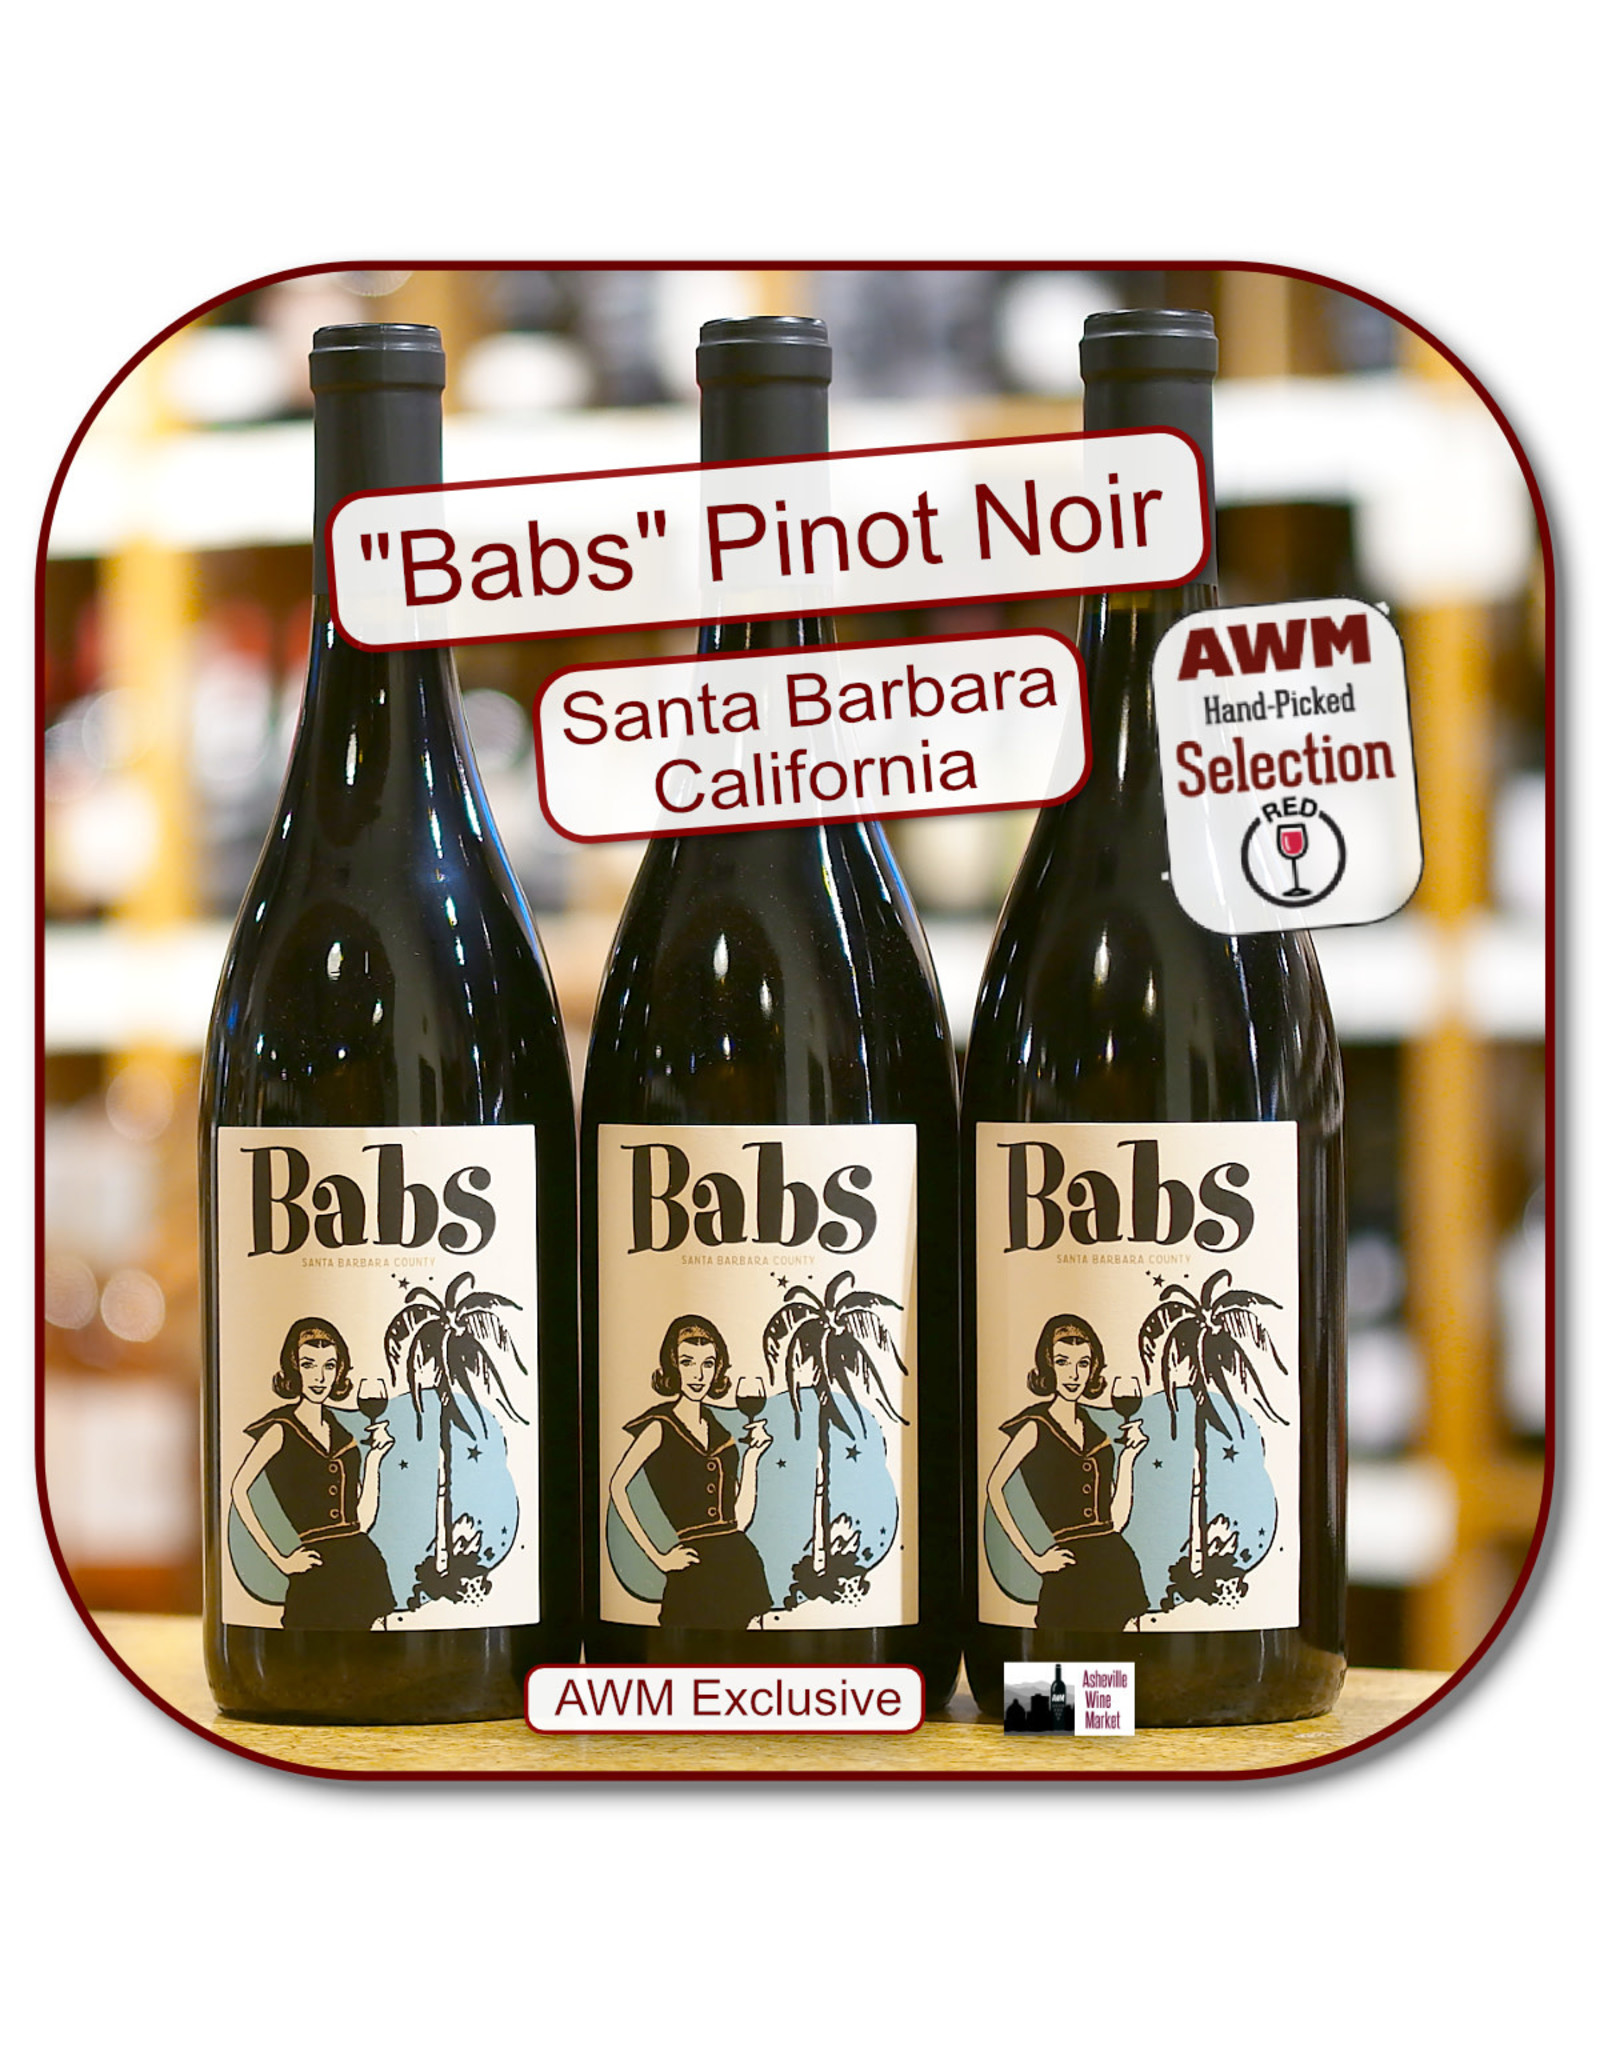 Pinot Noir Babs Santa Barbara County Pinot Noir 19